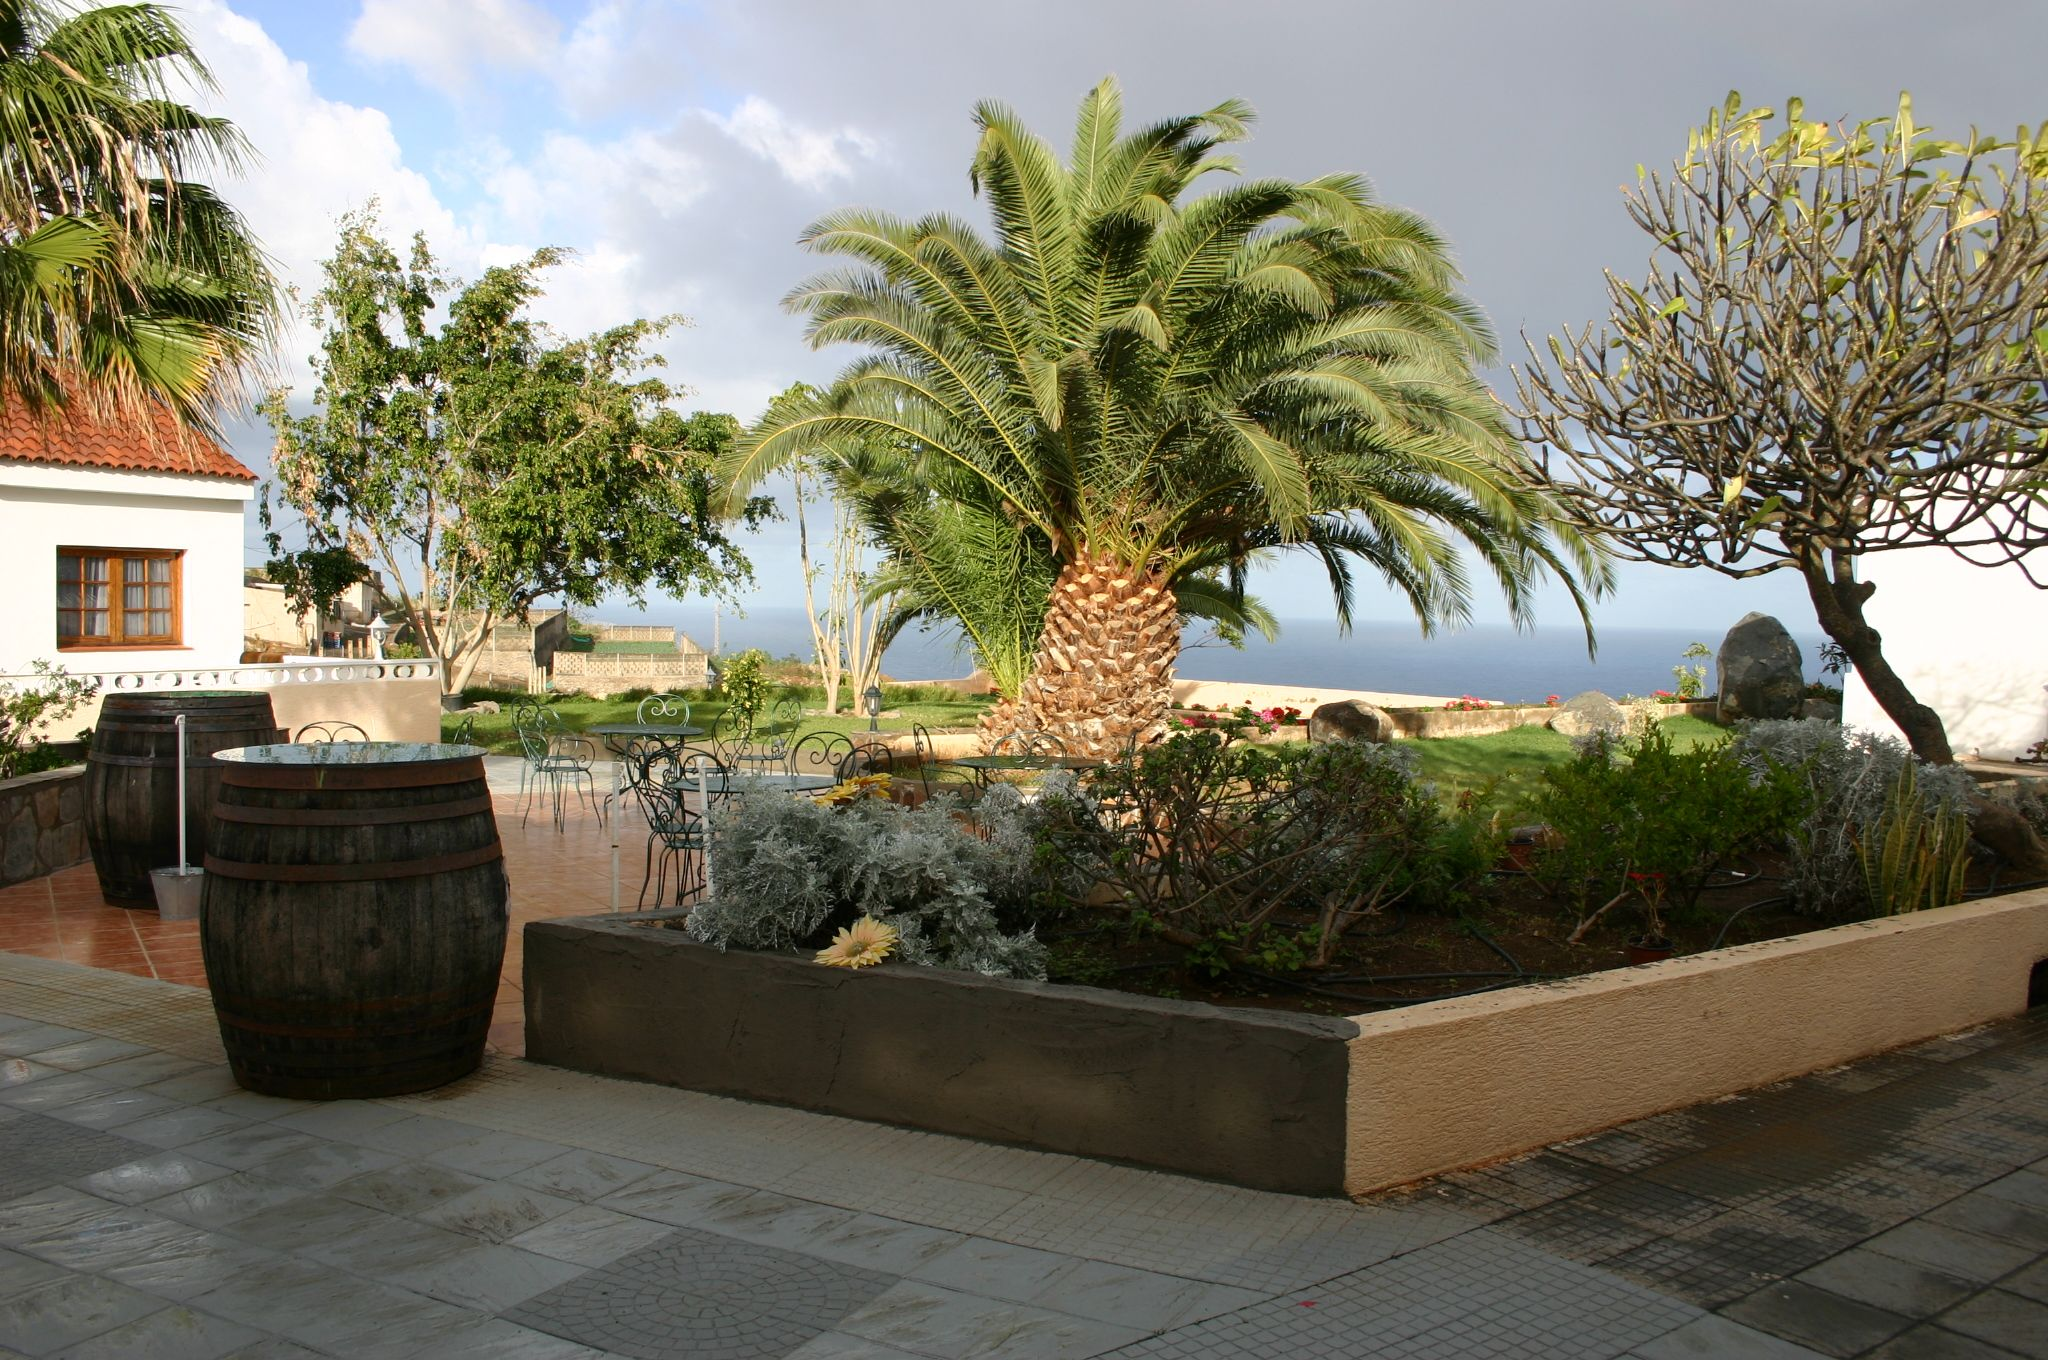 San Juan de la Rambla, Teneriffa Hotel Finca San Juan Apartment Gomera I www.teneriffa-mauritius.de